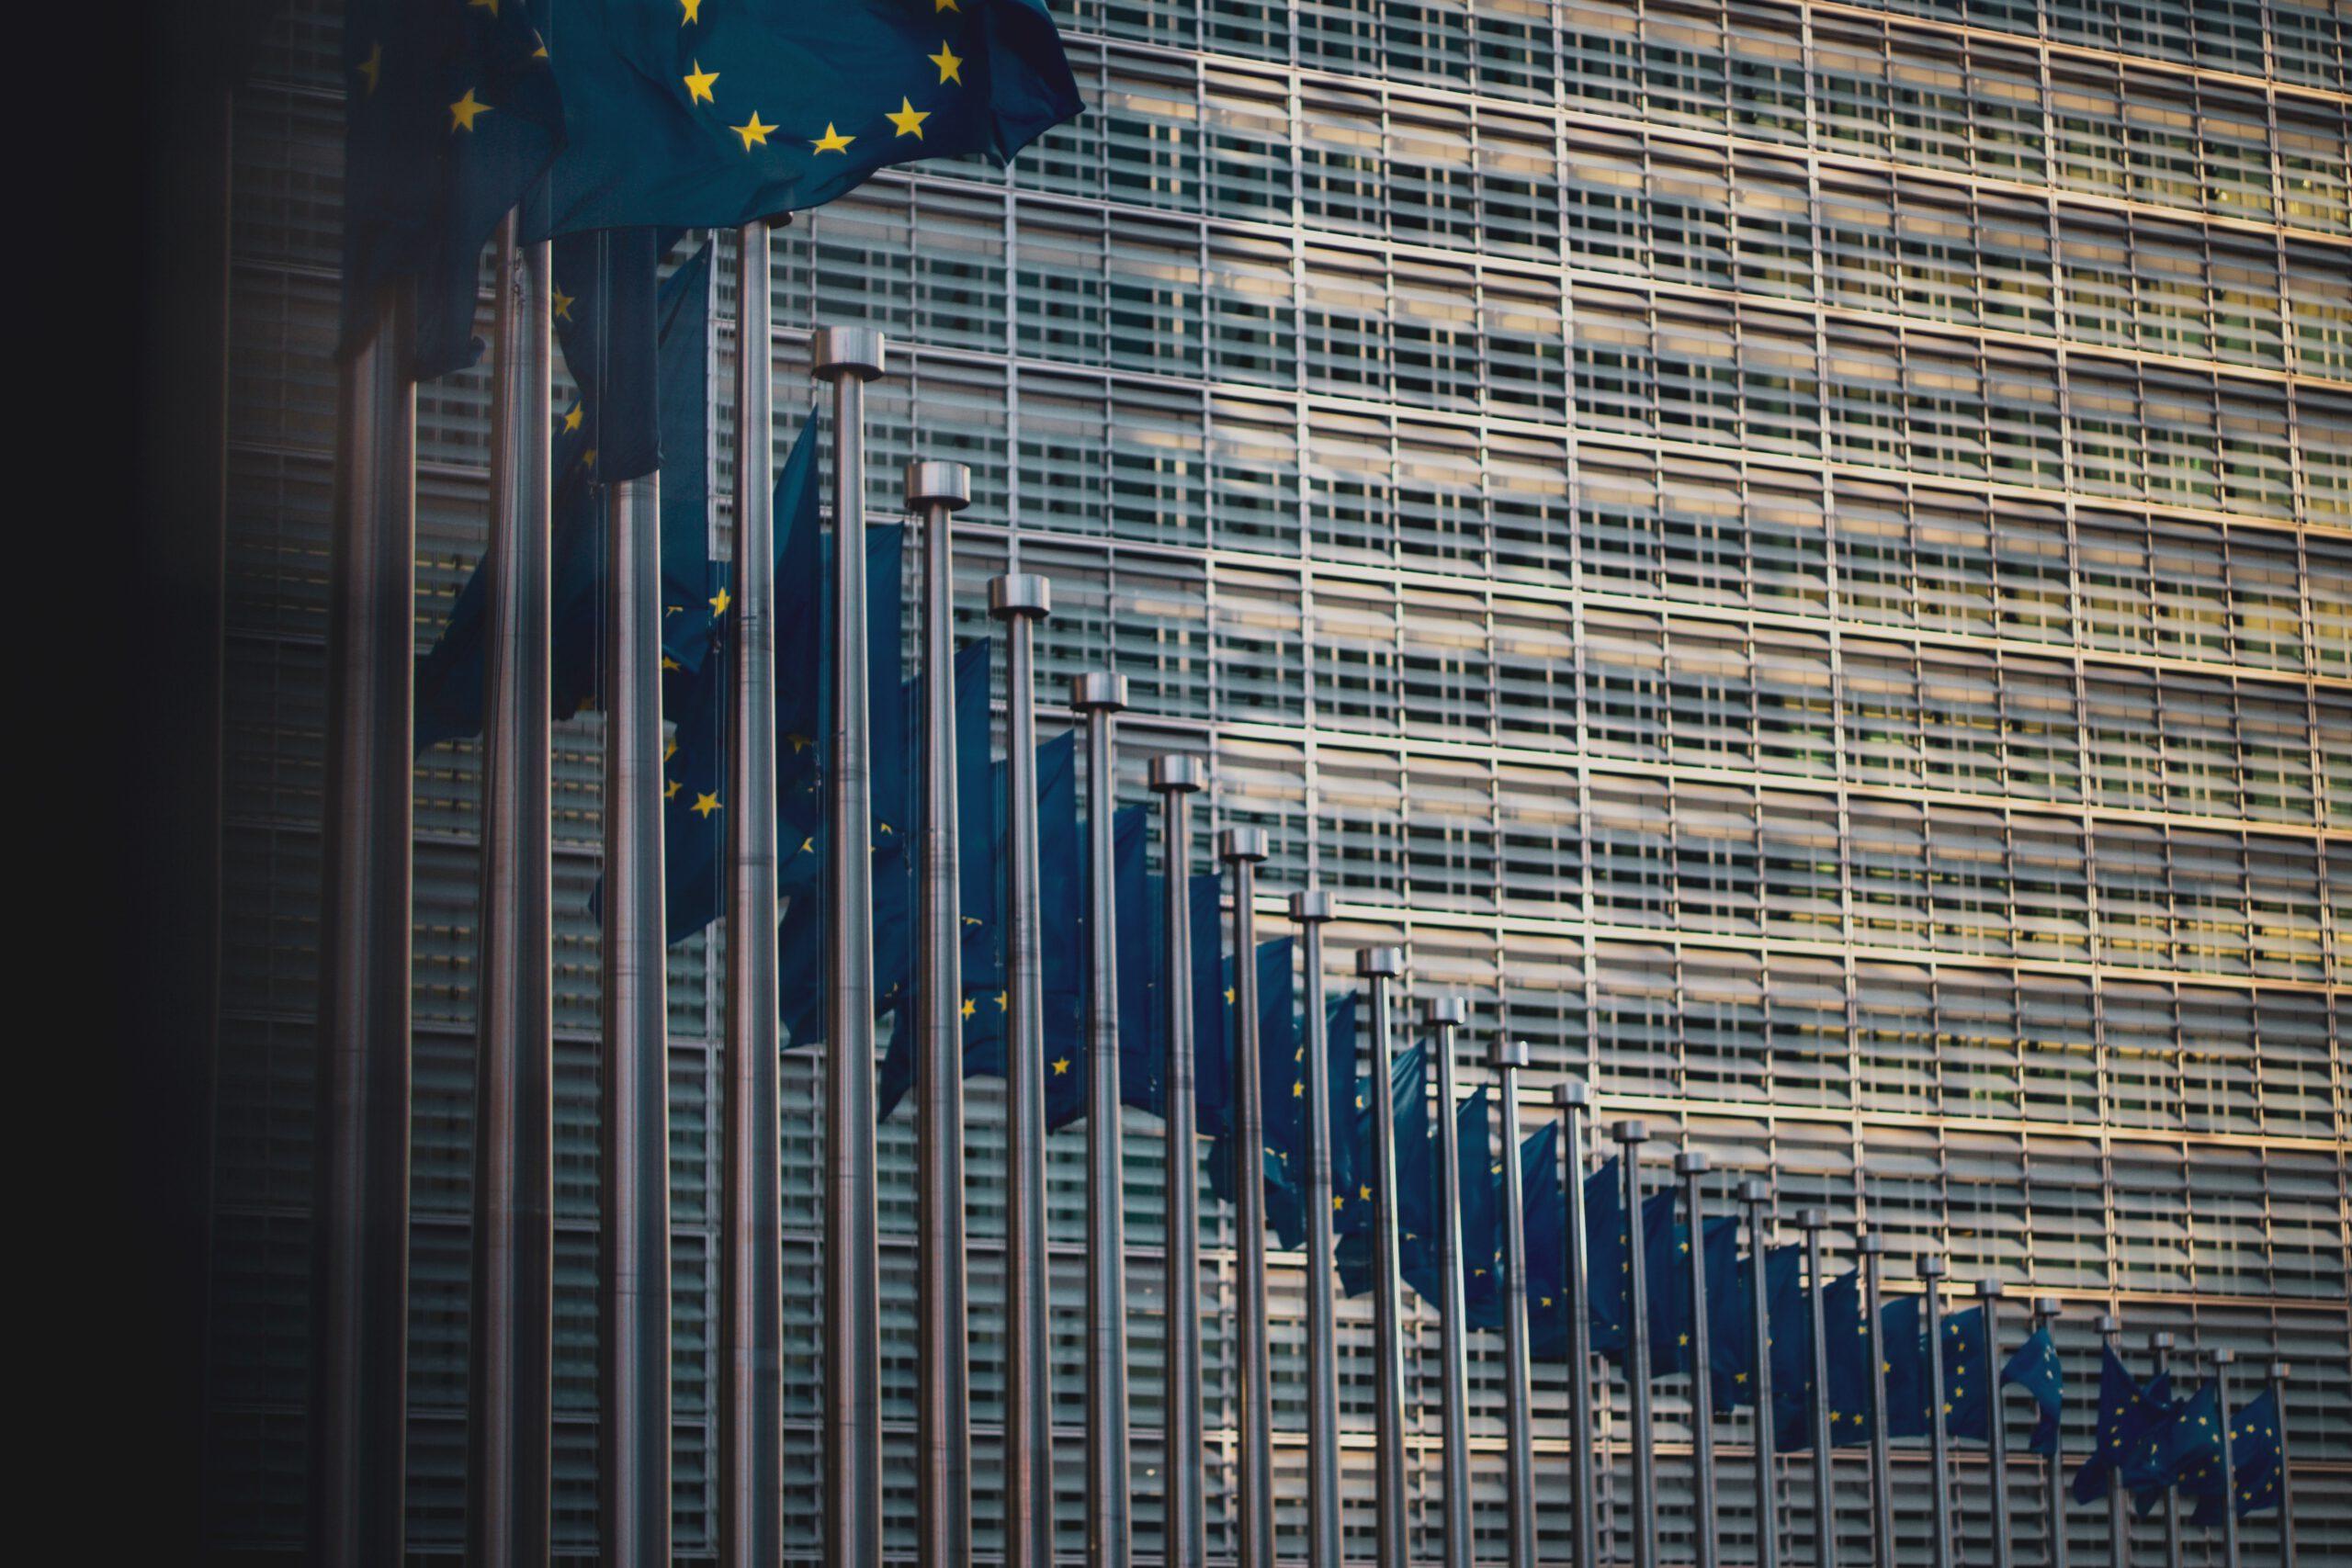 Europaflaggen vor der Europakommission